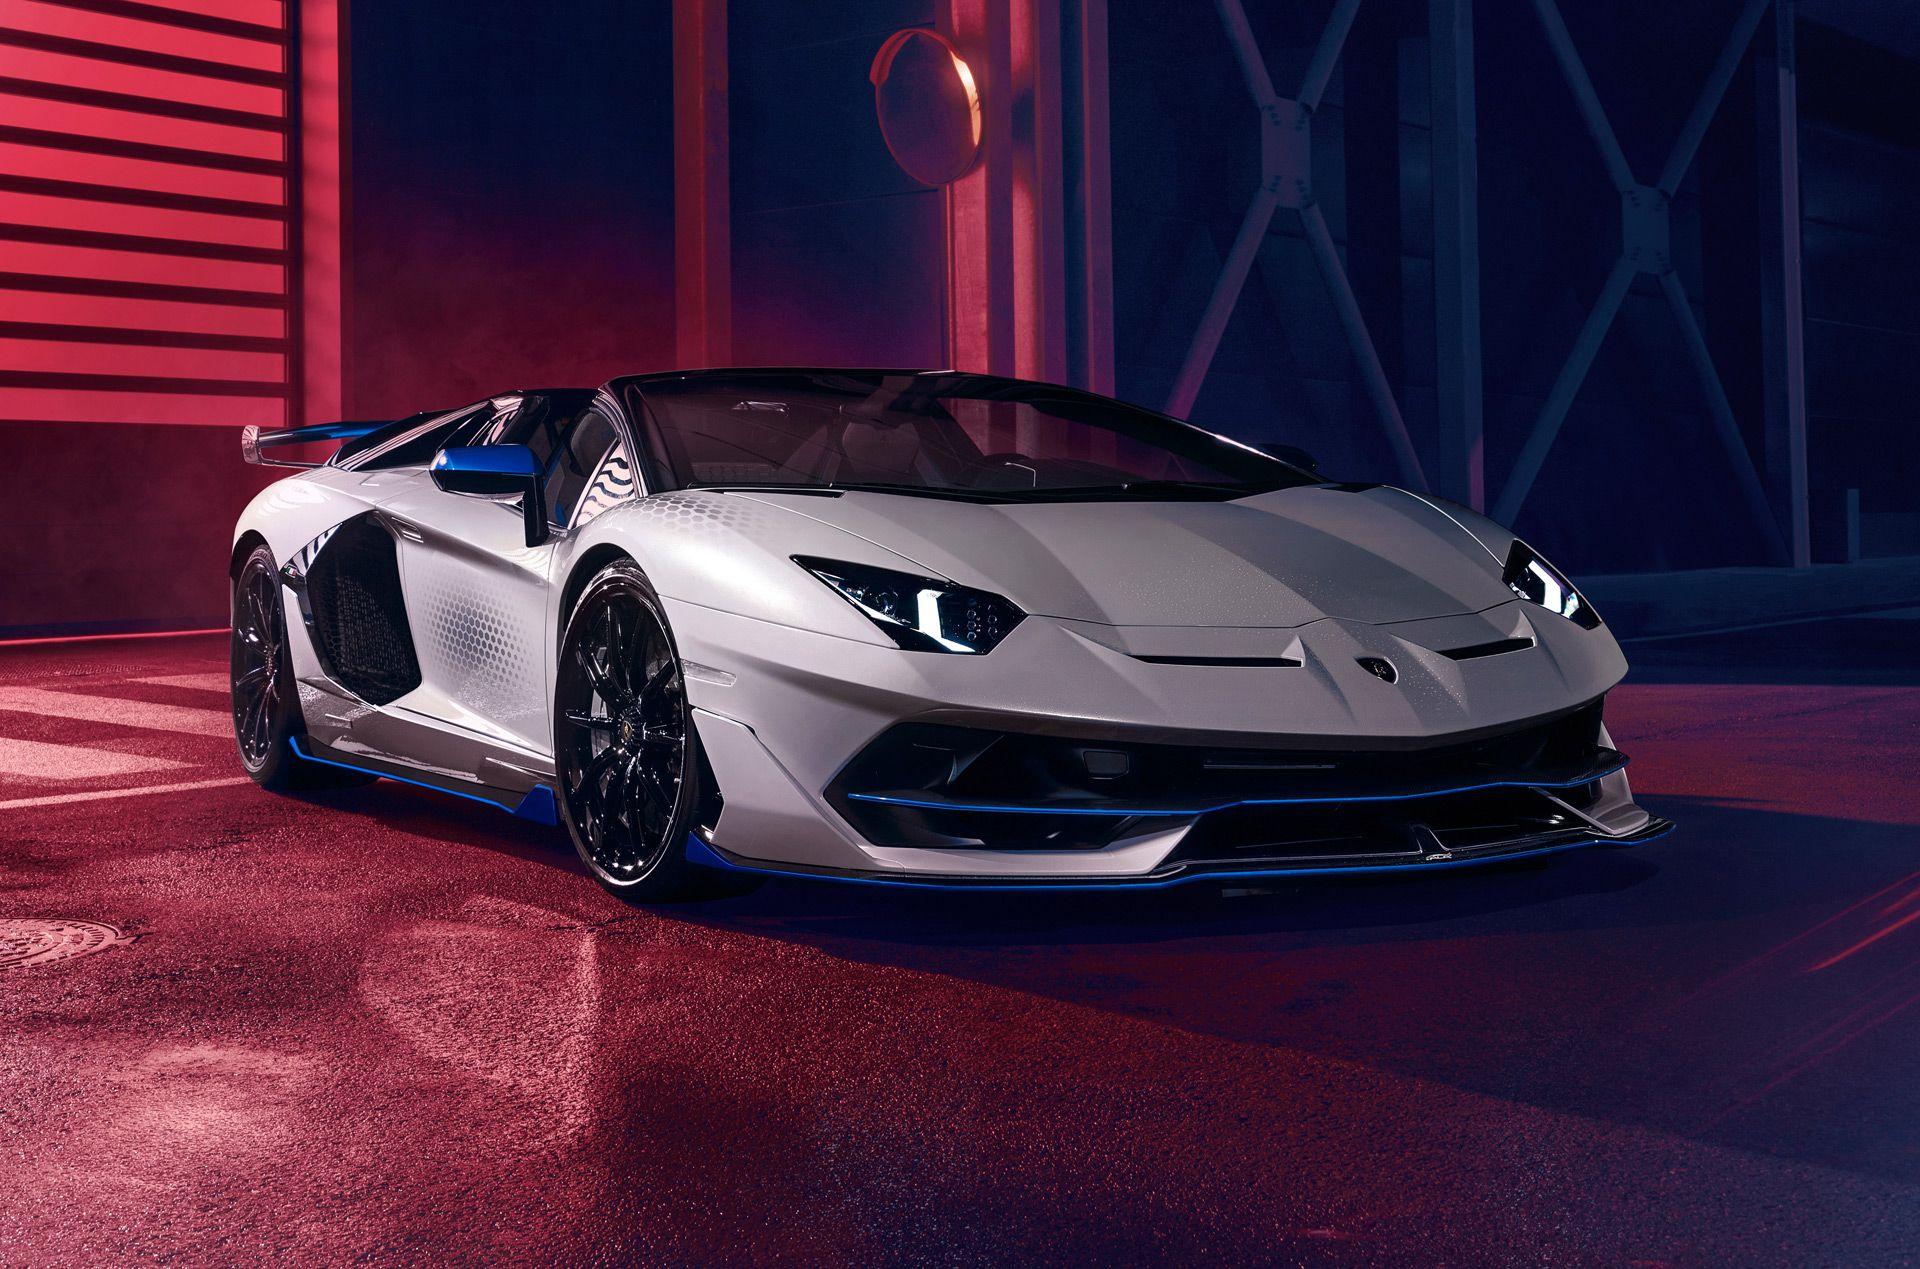 Lamborghini Aventador Svj Xago Ad Personam Special Limited To 10 Cars In 2020 Lamborghini Aventador Lamborghini Lamborghini Models